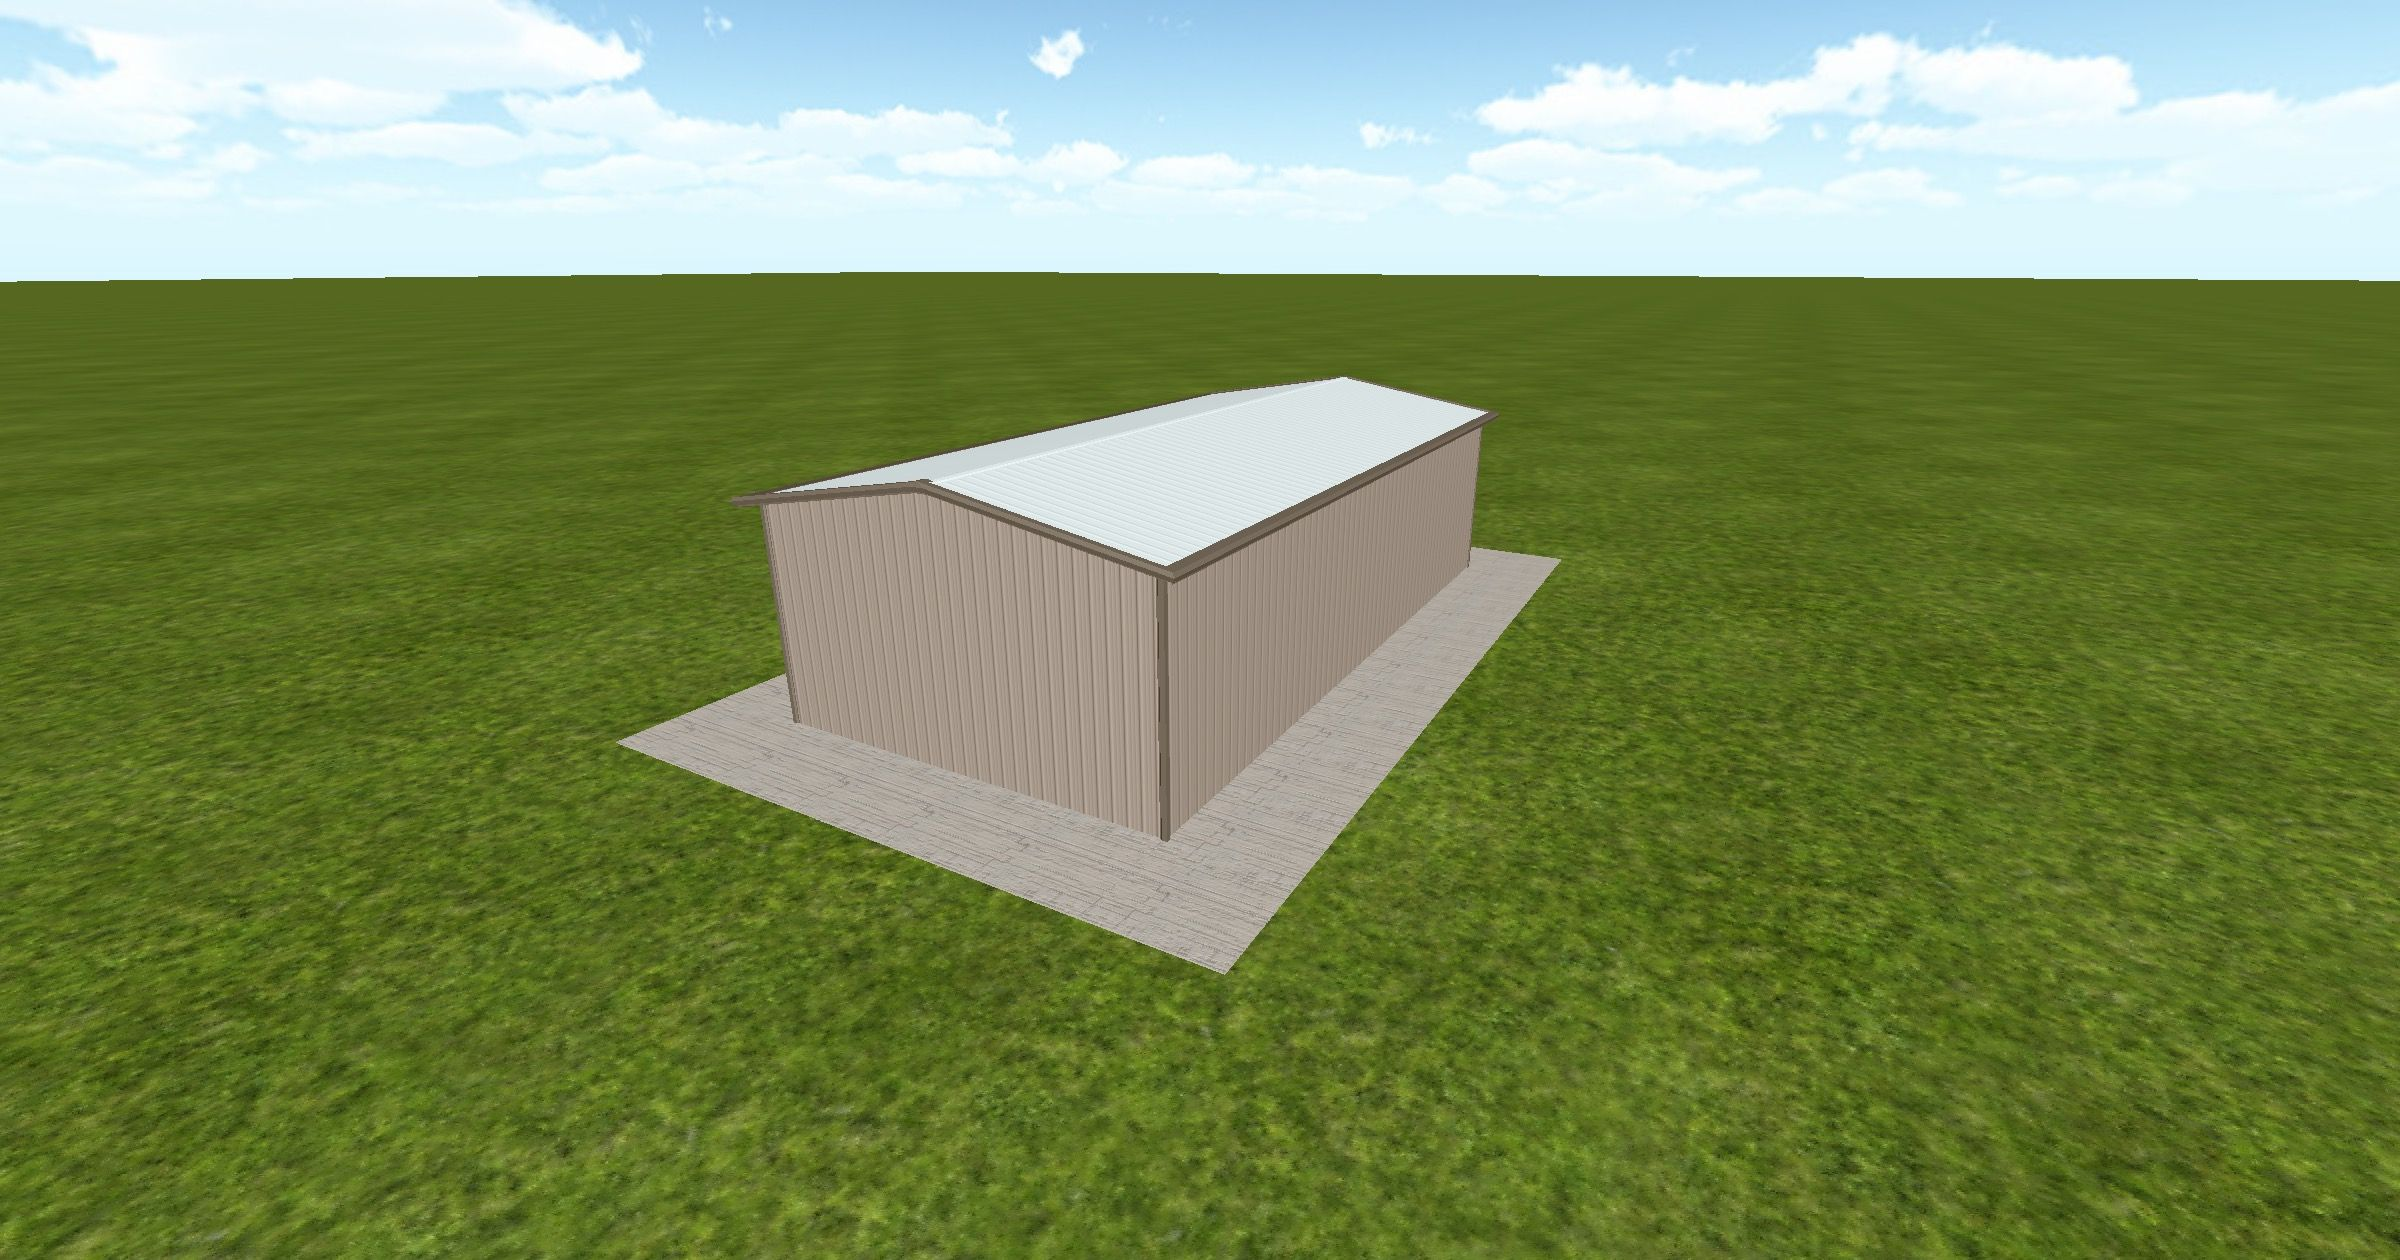 3d Building Built Using Viral3d Web Based Design Tool Http Ift Tt 1na0eau 360 Virtual Construction Mueller Buildings 3d Building Design Modern Roofing